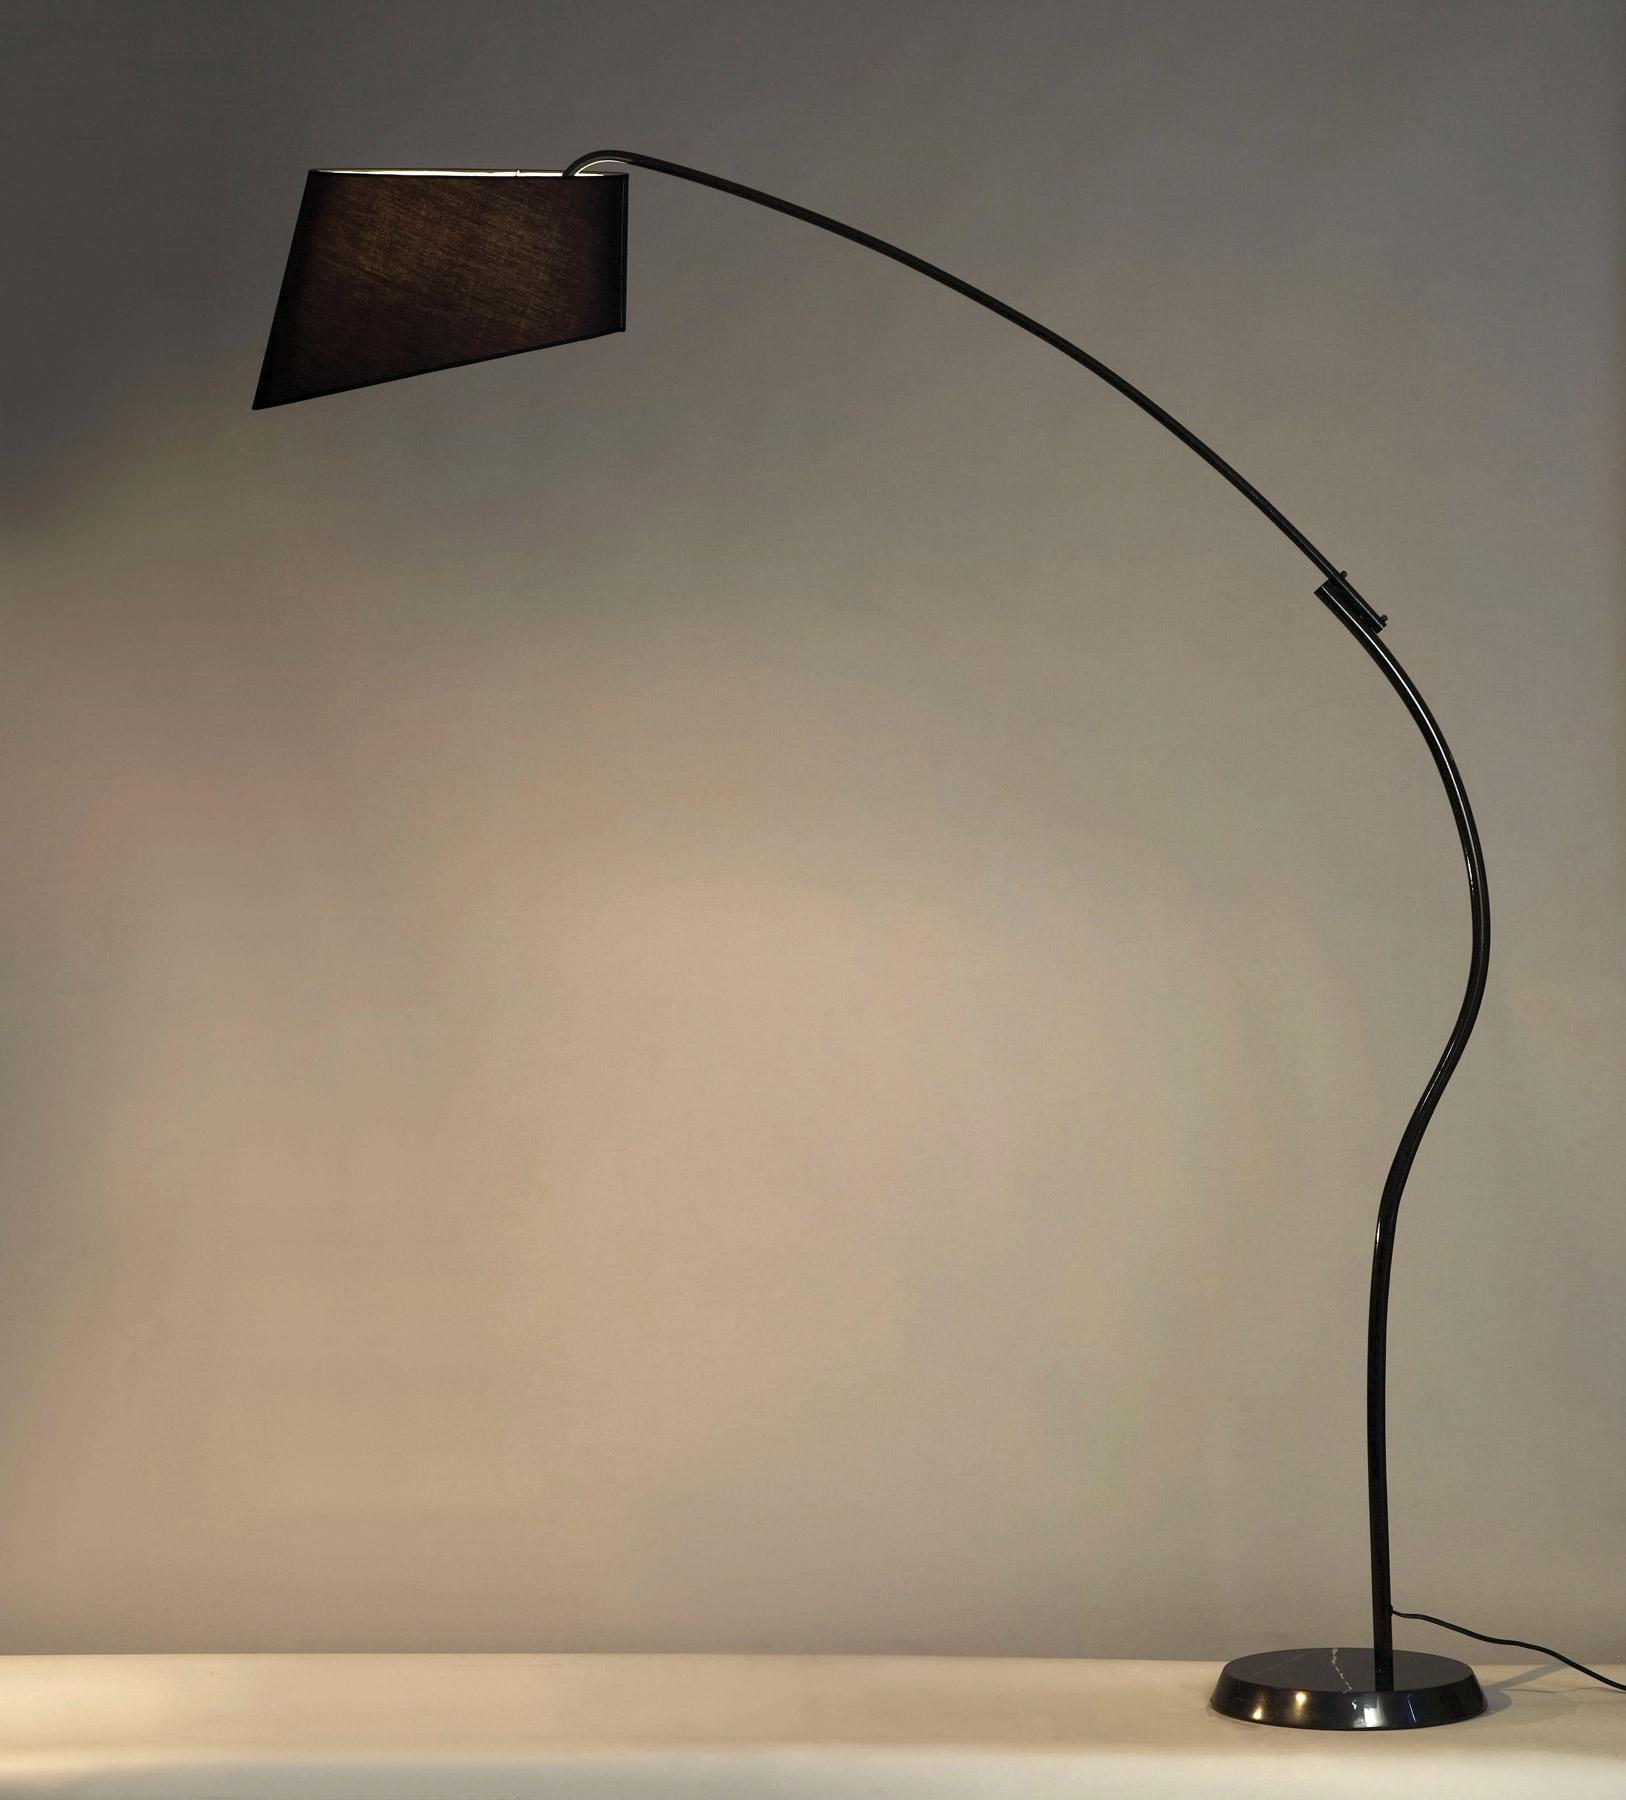 Lighting 11717 ibis black arc floor lamp nova lighting 11717 ibis black arc floor lamp mozeypictures Gallery